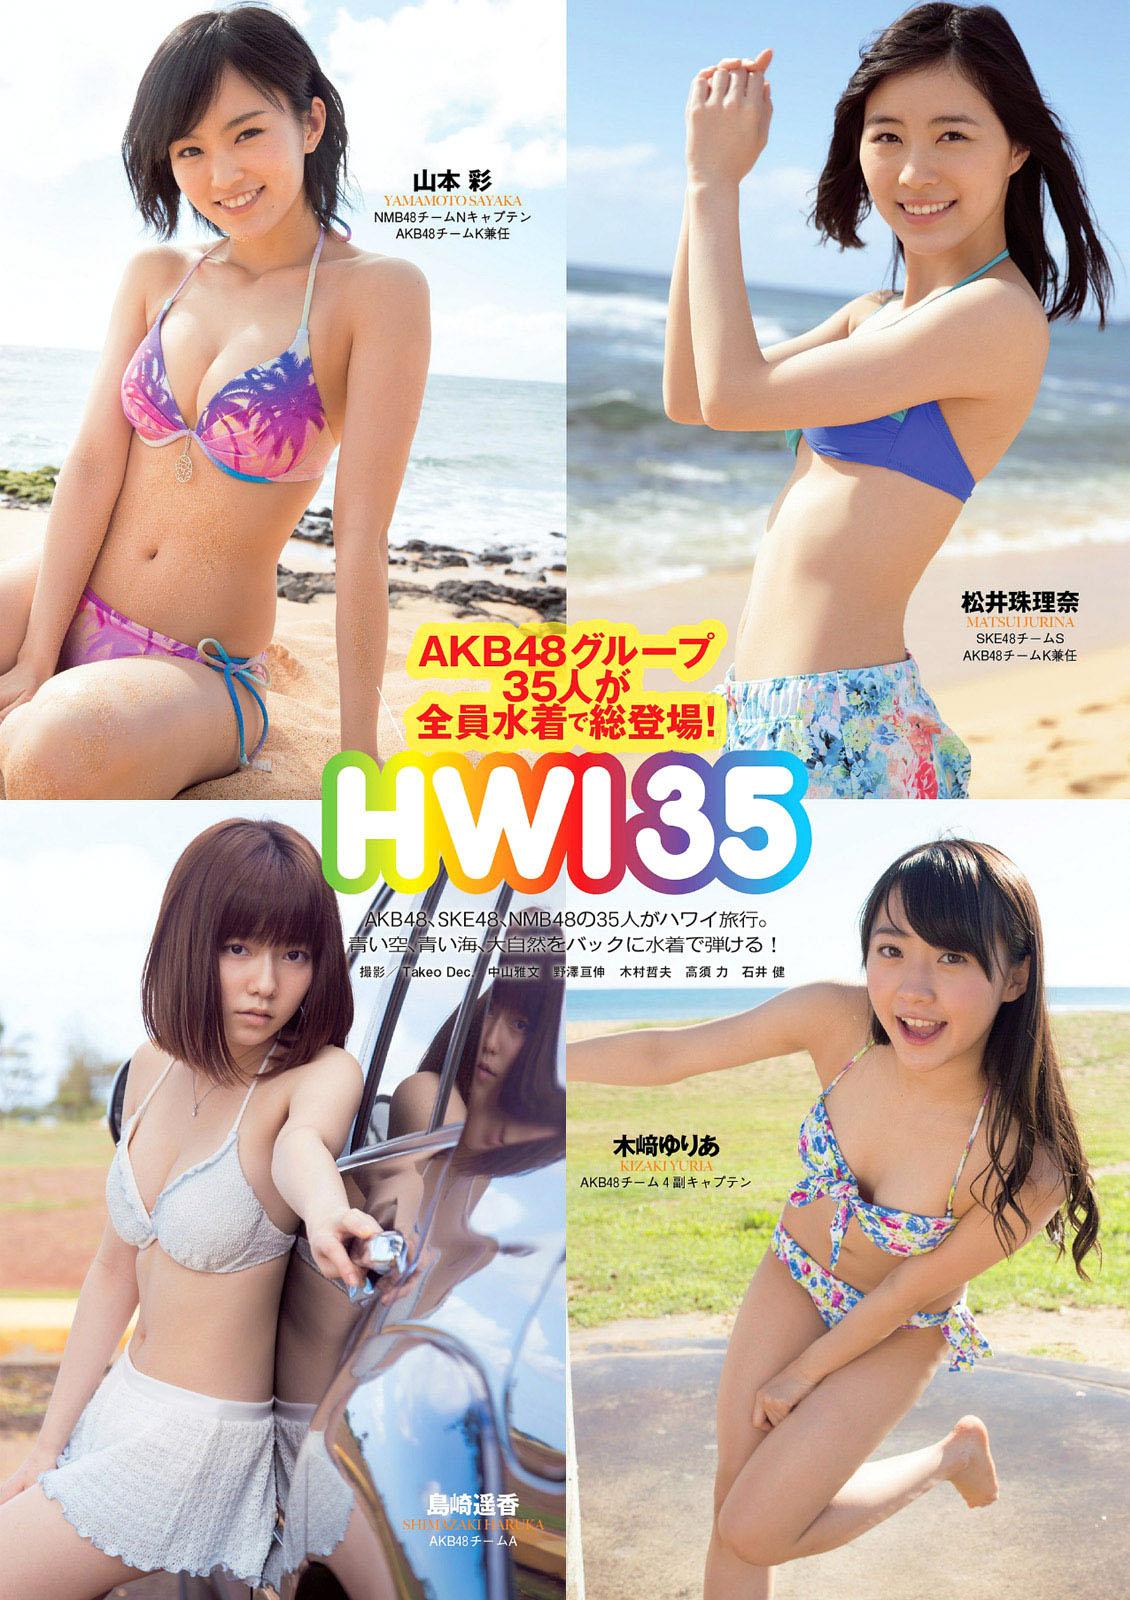 AKB48 WPB 140414 01.jpg